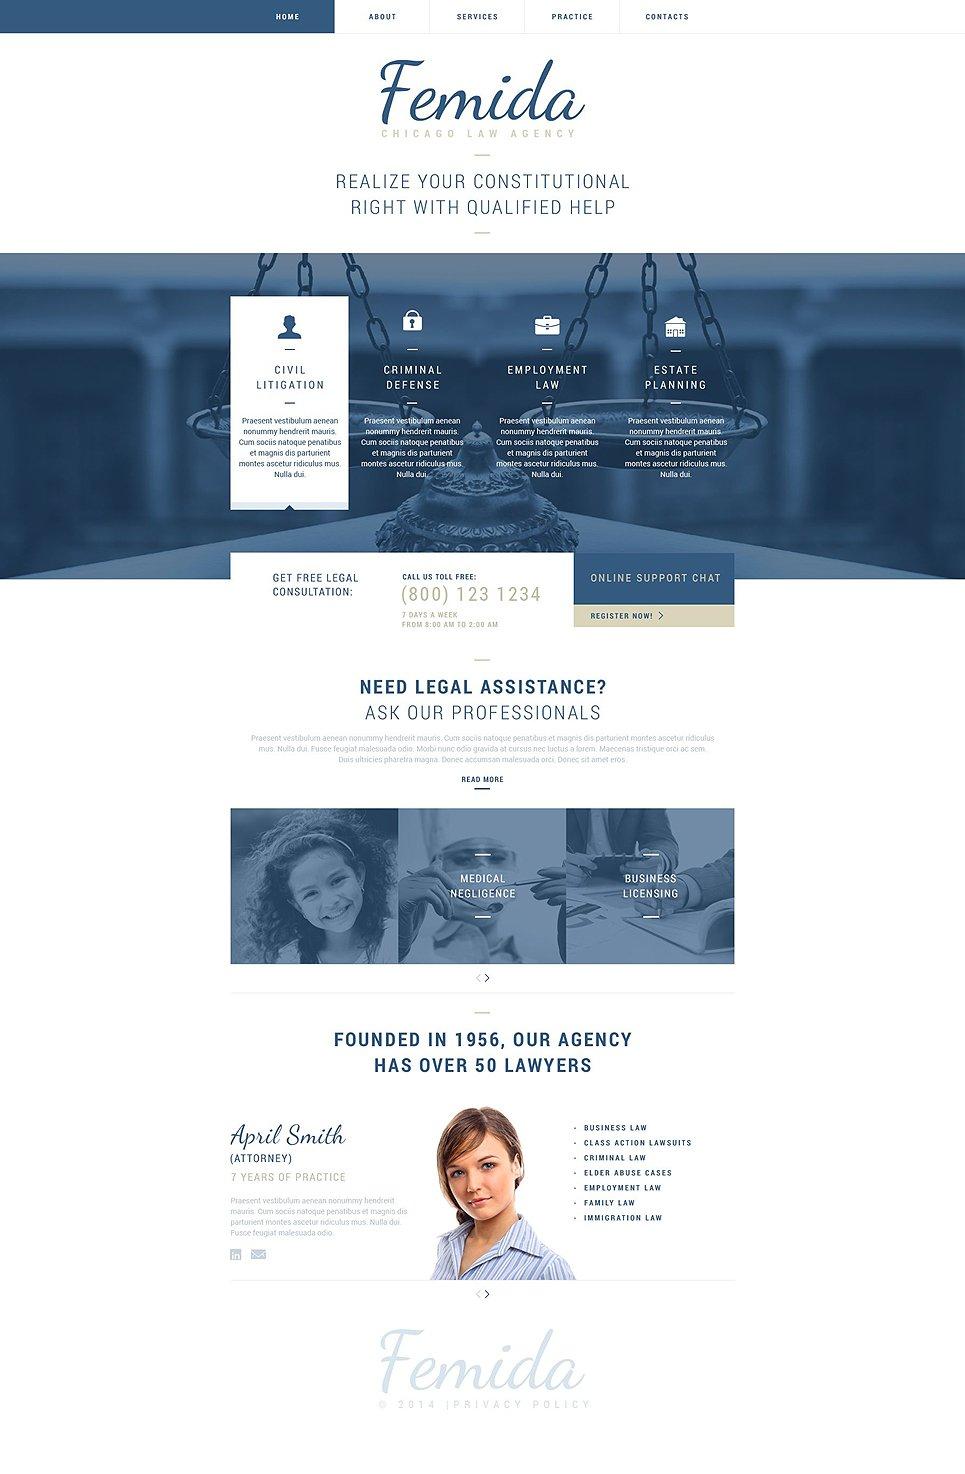 law firm responsive website template 51827. Black Bedroom Furniture Sets. Home Design Ideas